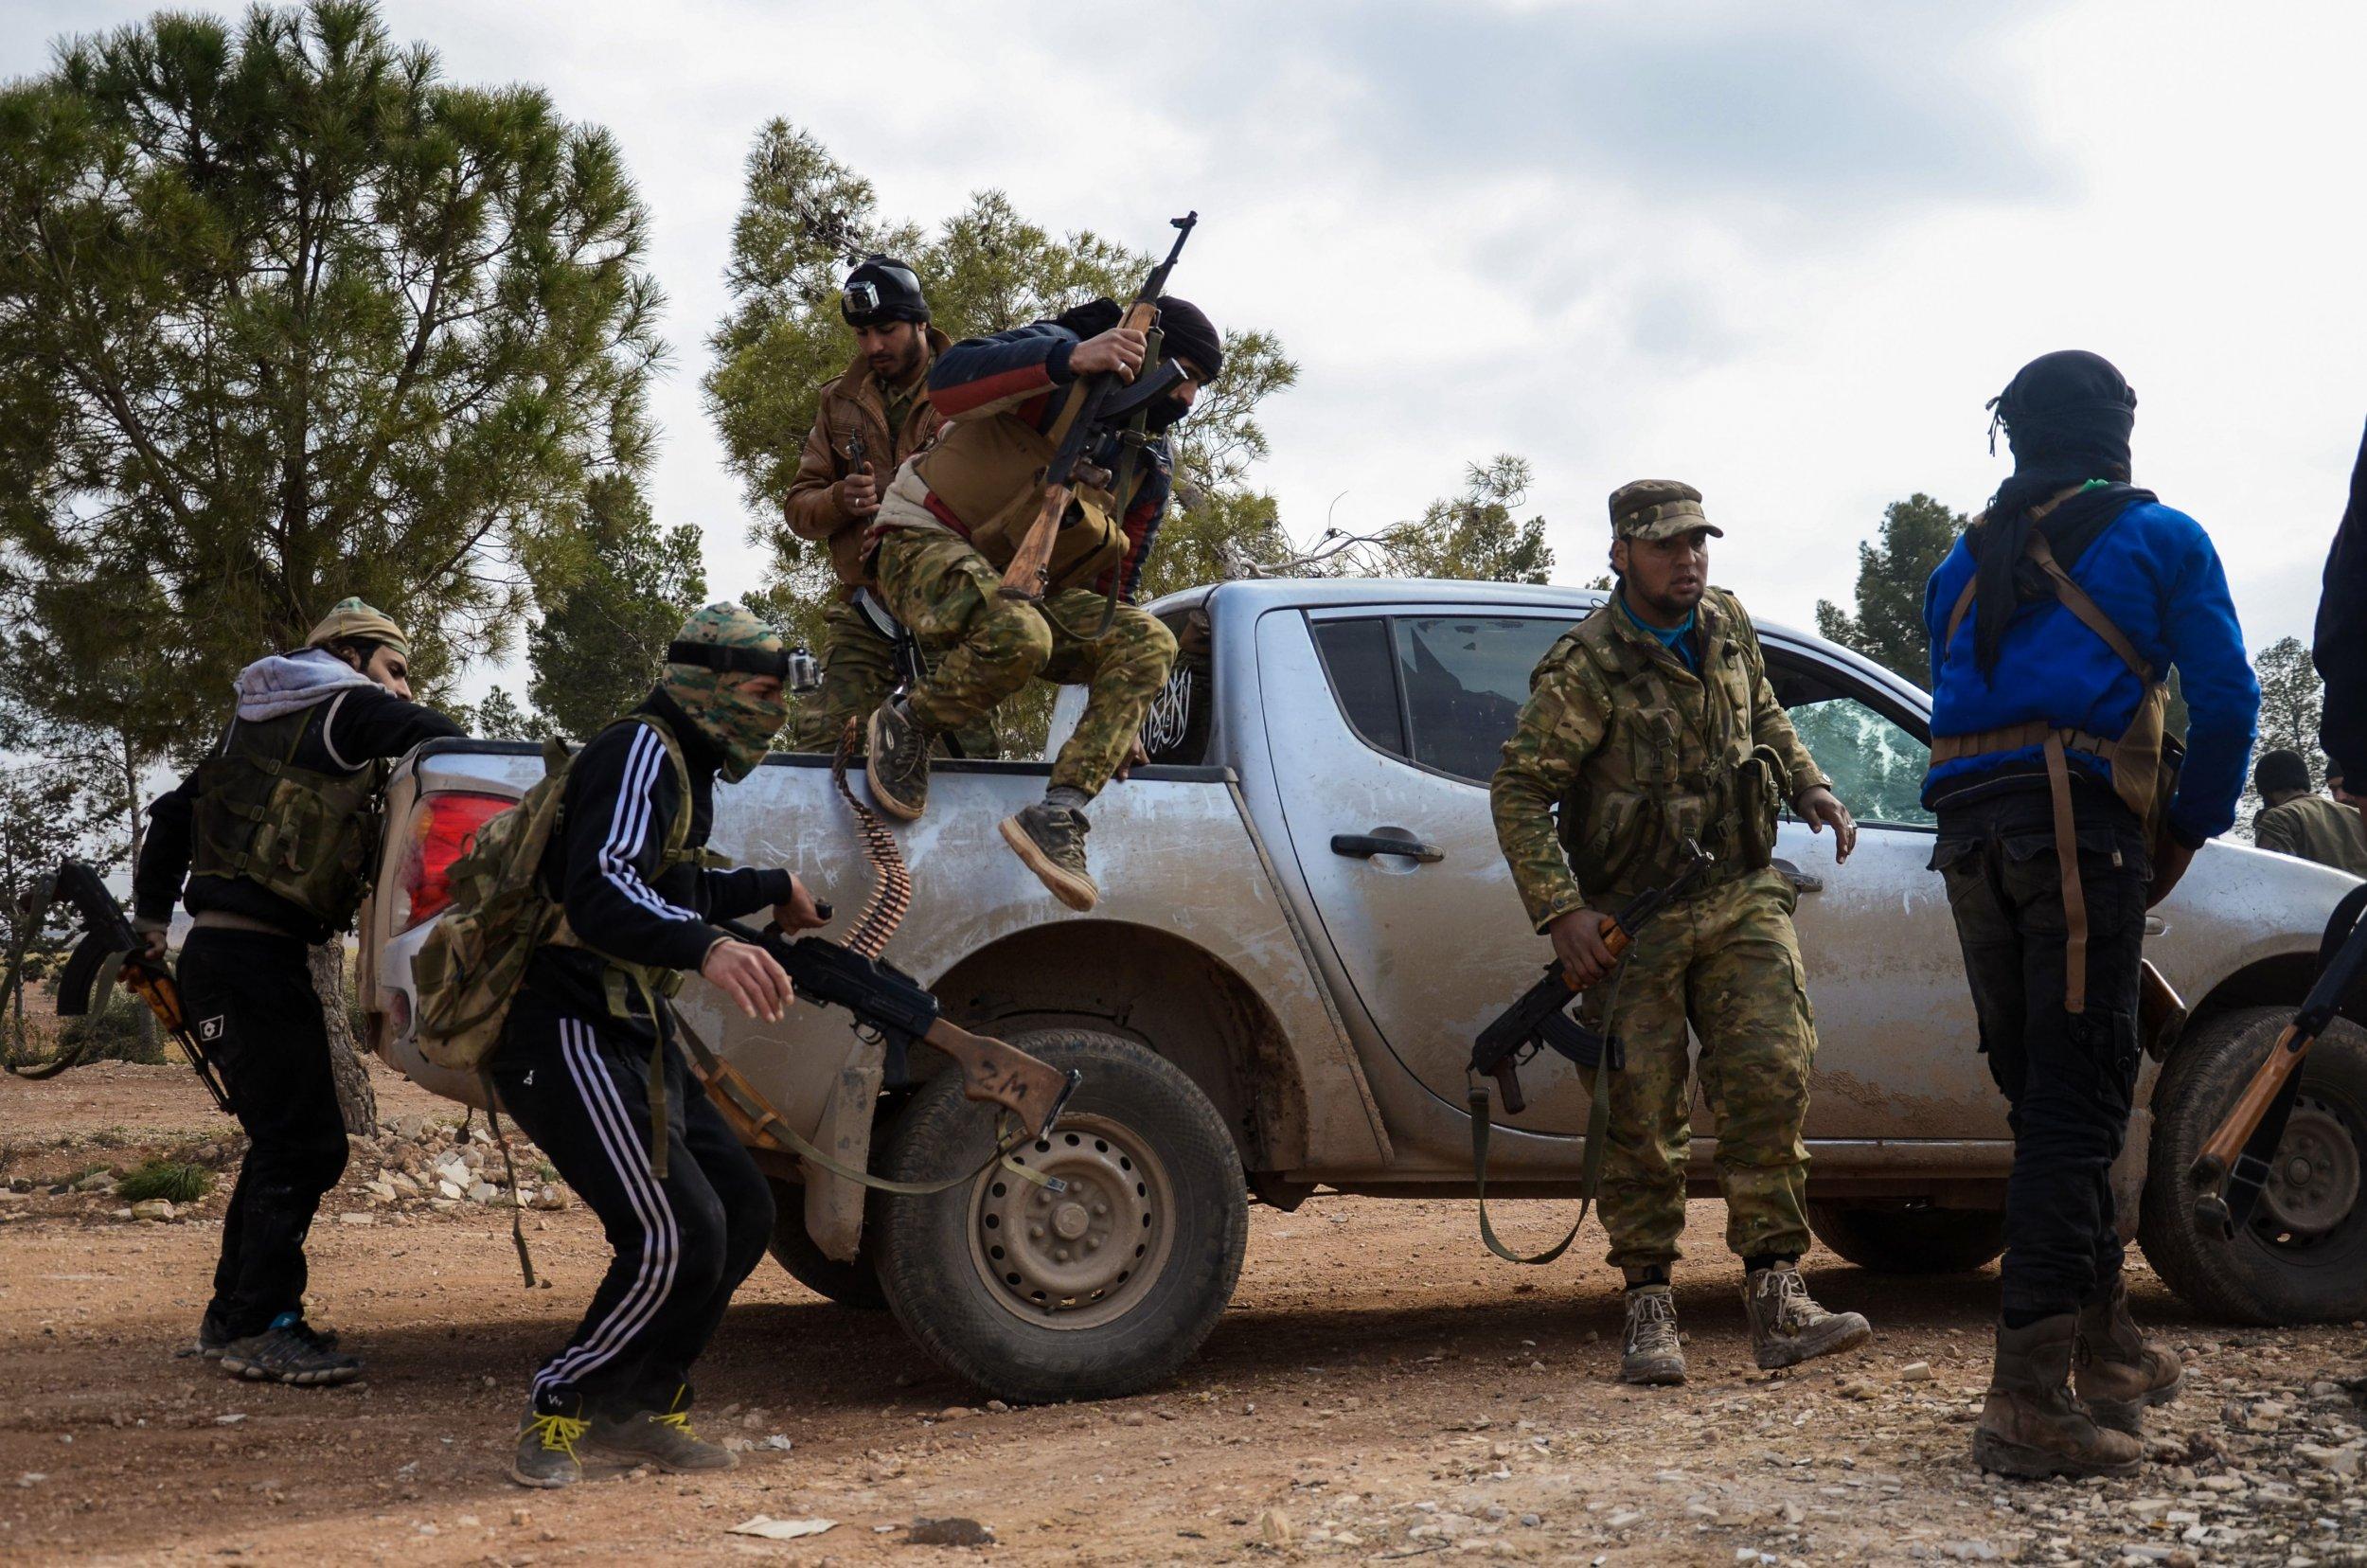 Syrian rebels in Al-Bab